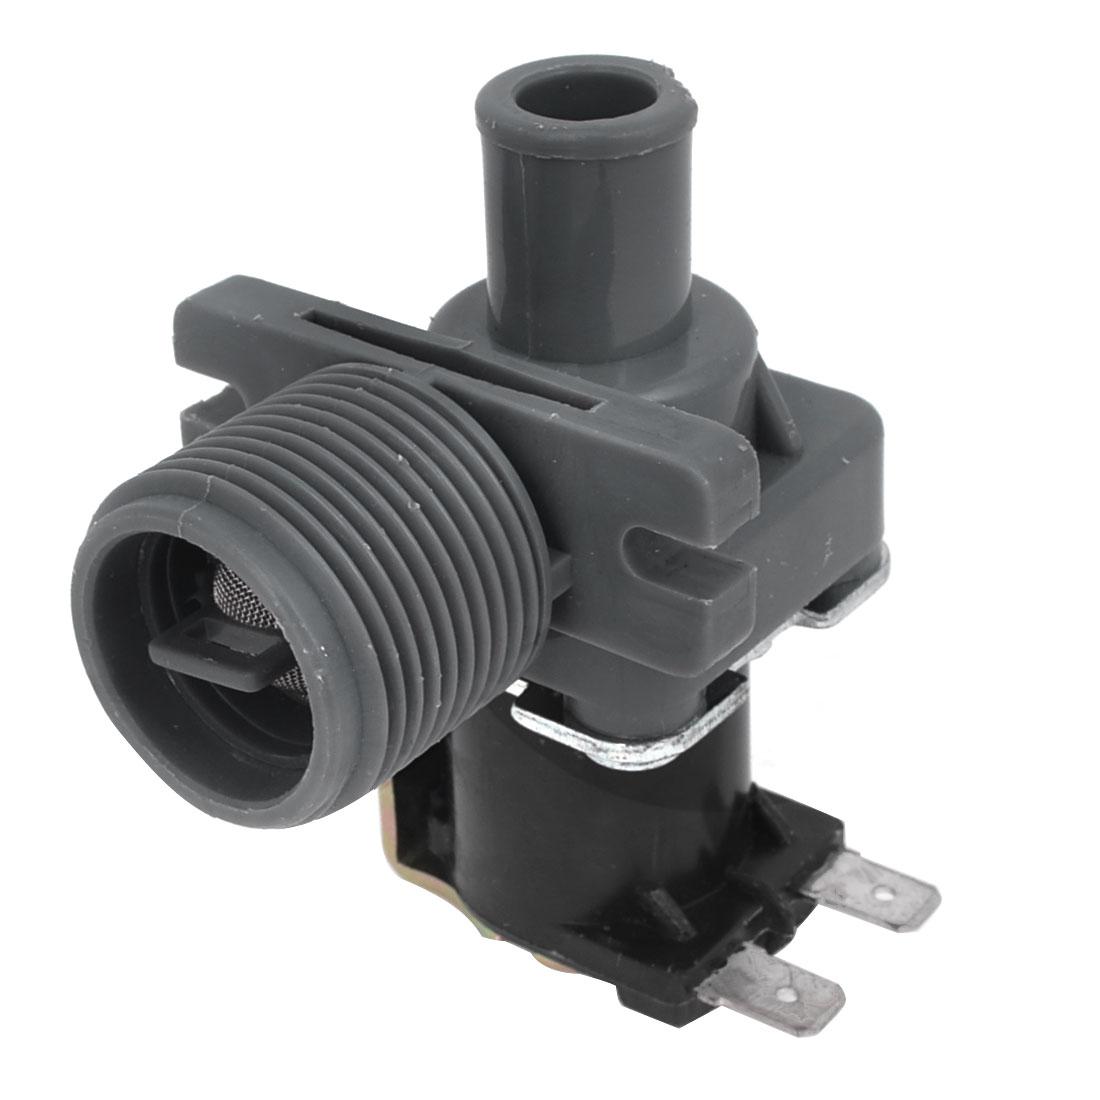 AC 220-240V 50/60Hz 2 Pole Water Inlet Solenoid Valve for Washing Machine